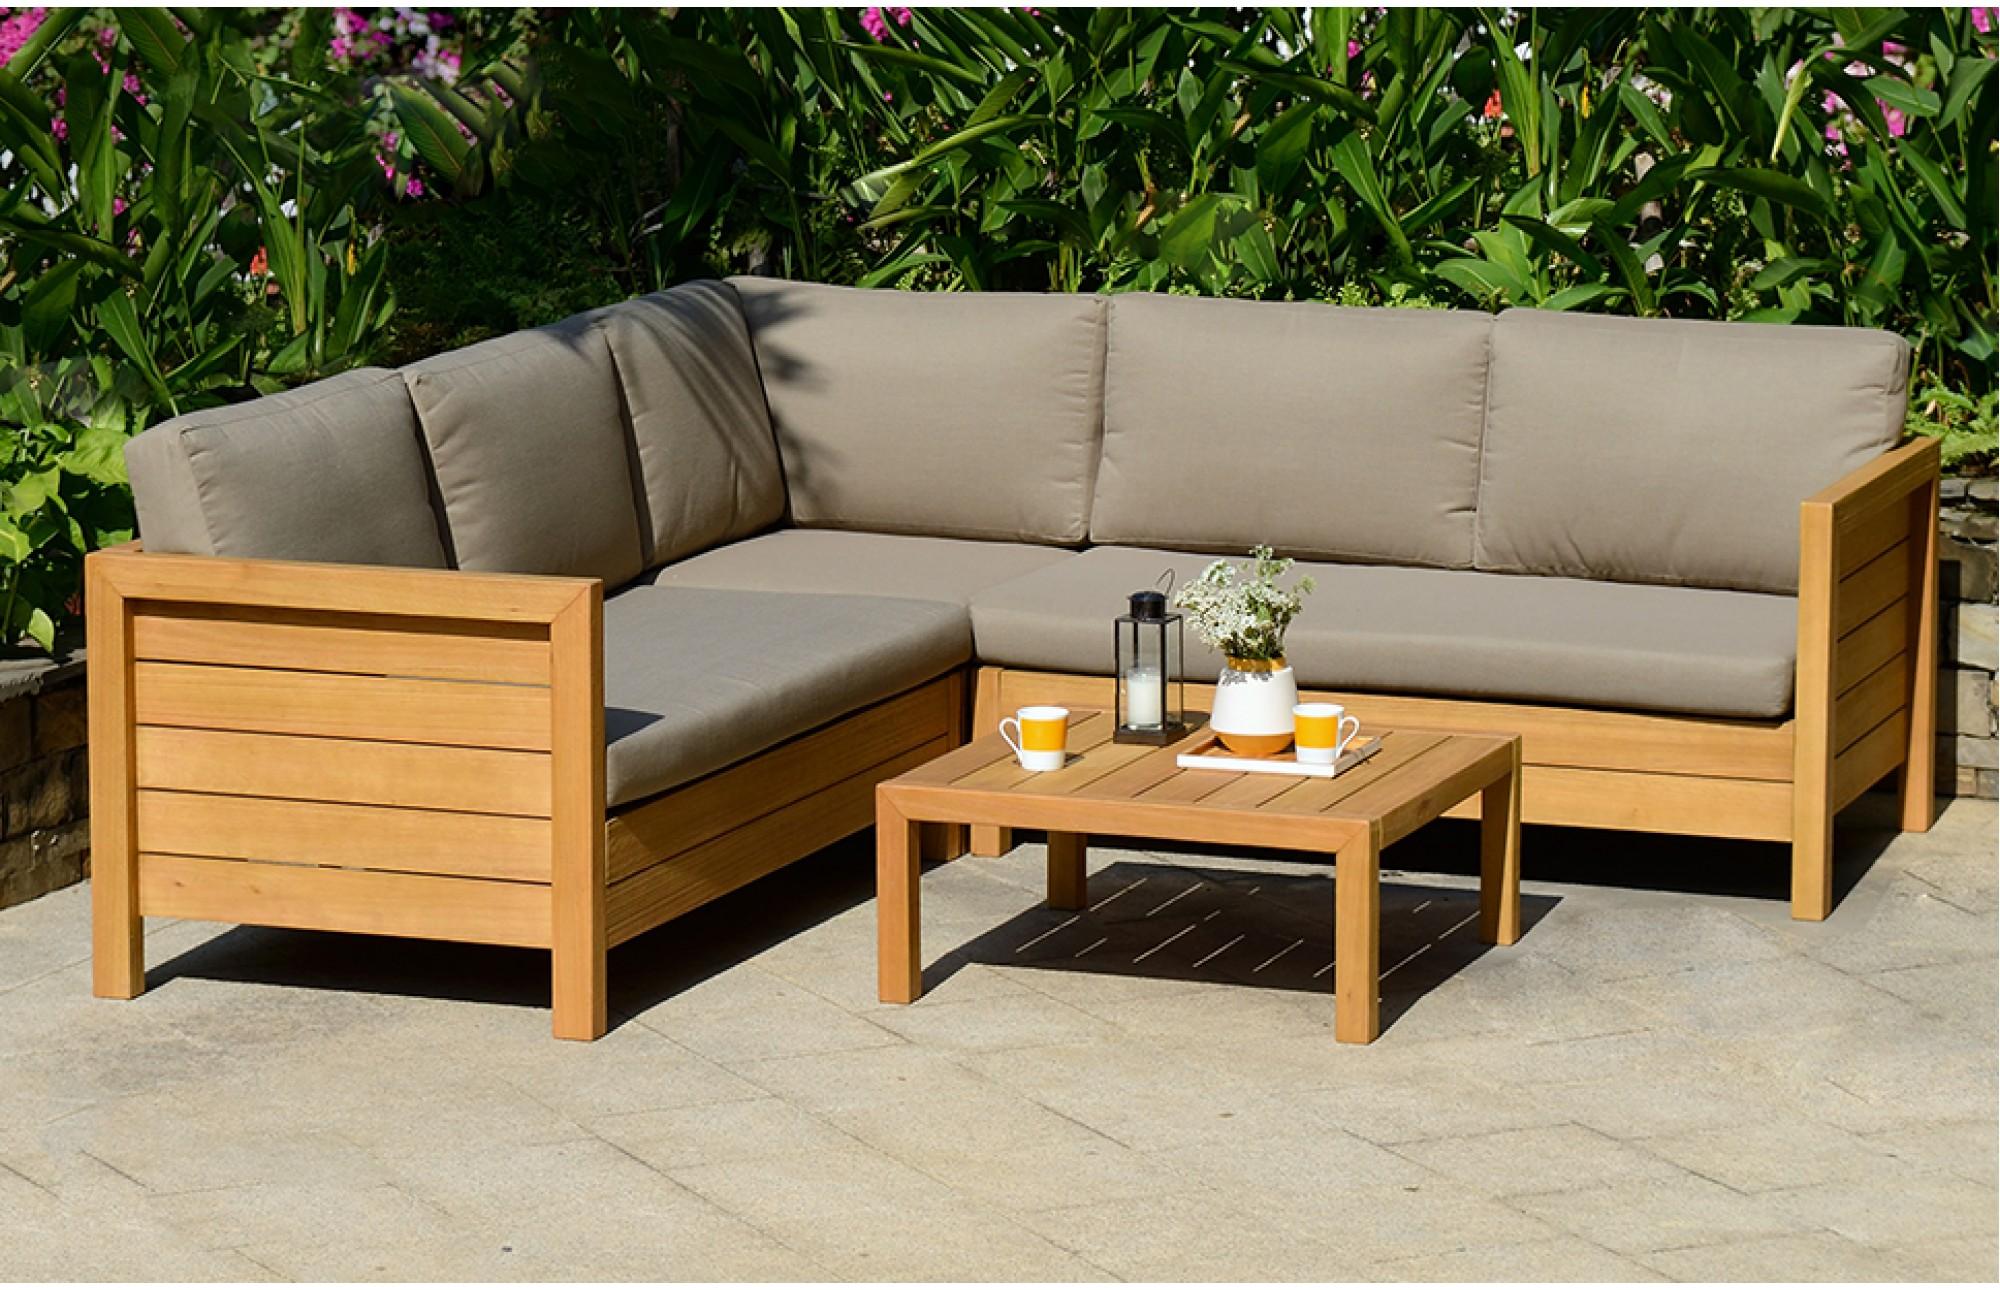 Outdoor Teak Furniture Dubai Uae